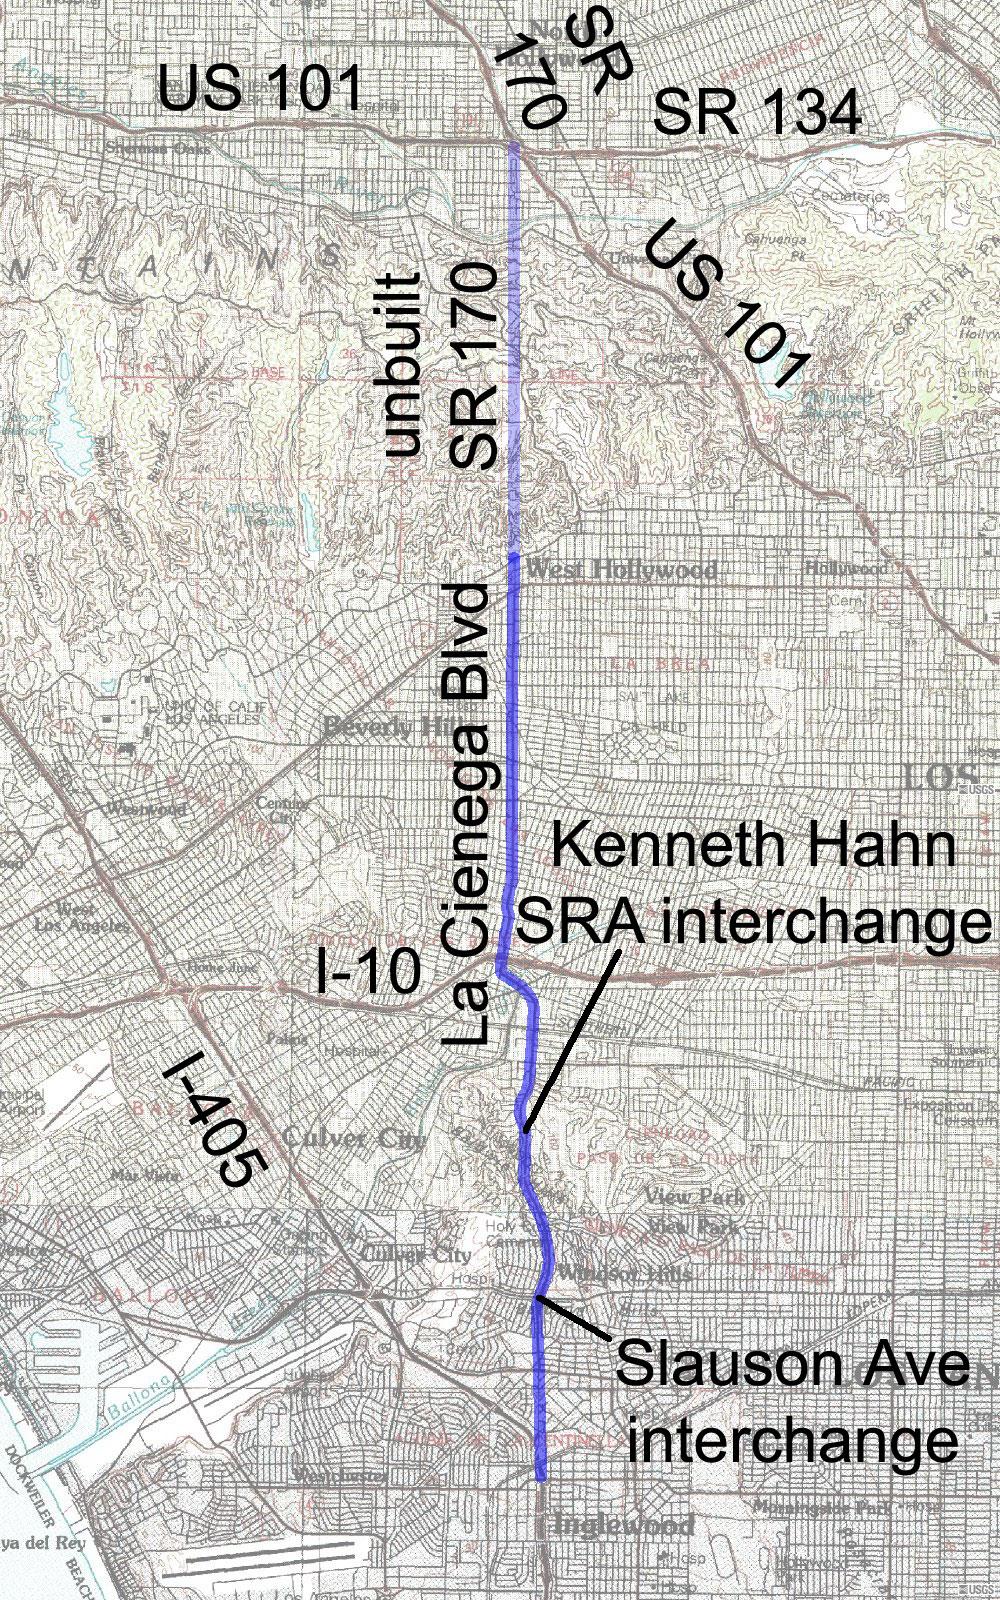 Sunset Strip Map : sunset, strip, Cienega, Boulevard, Wikipedia